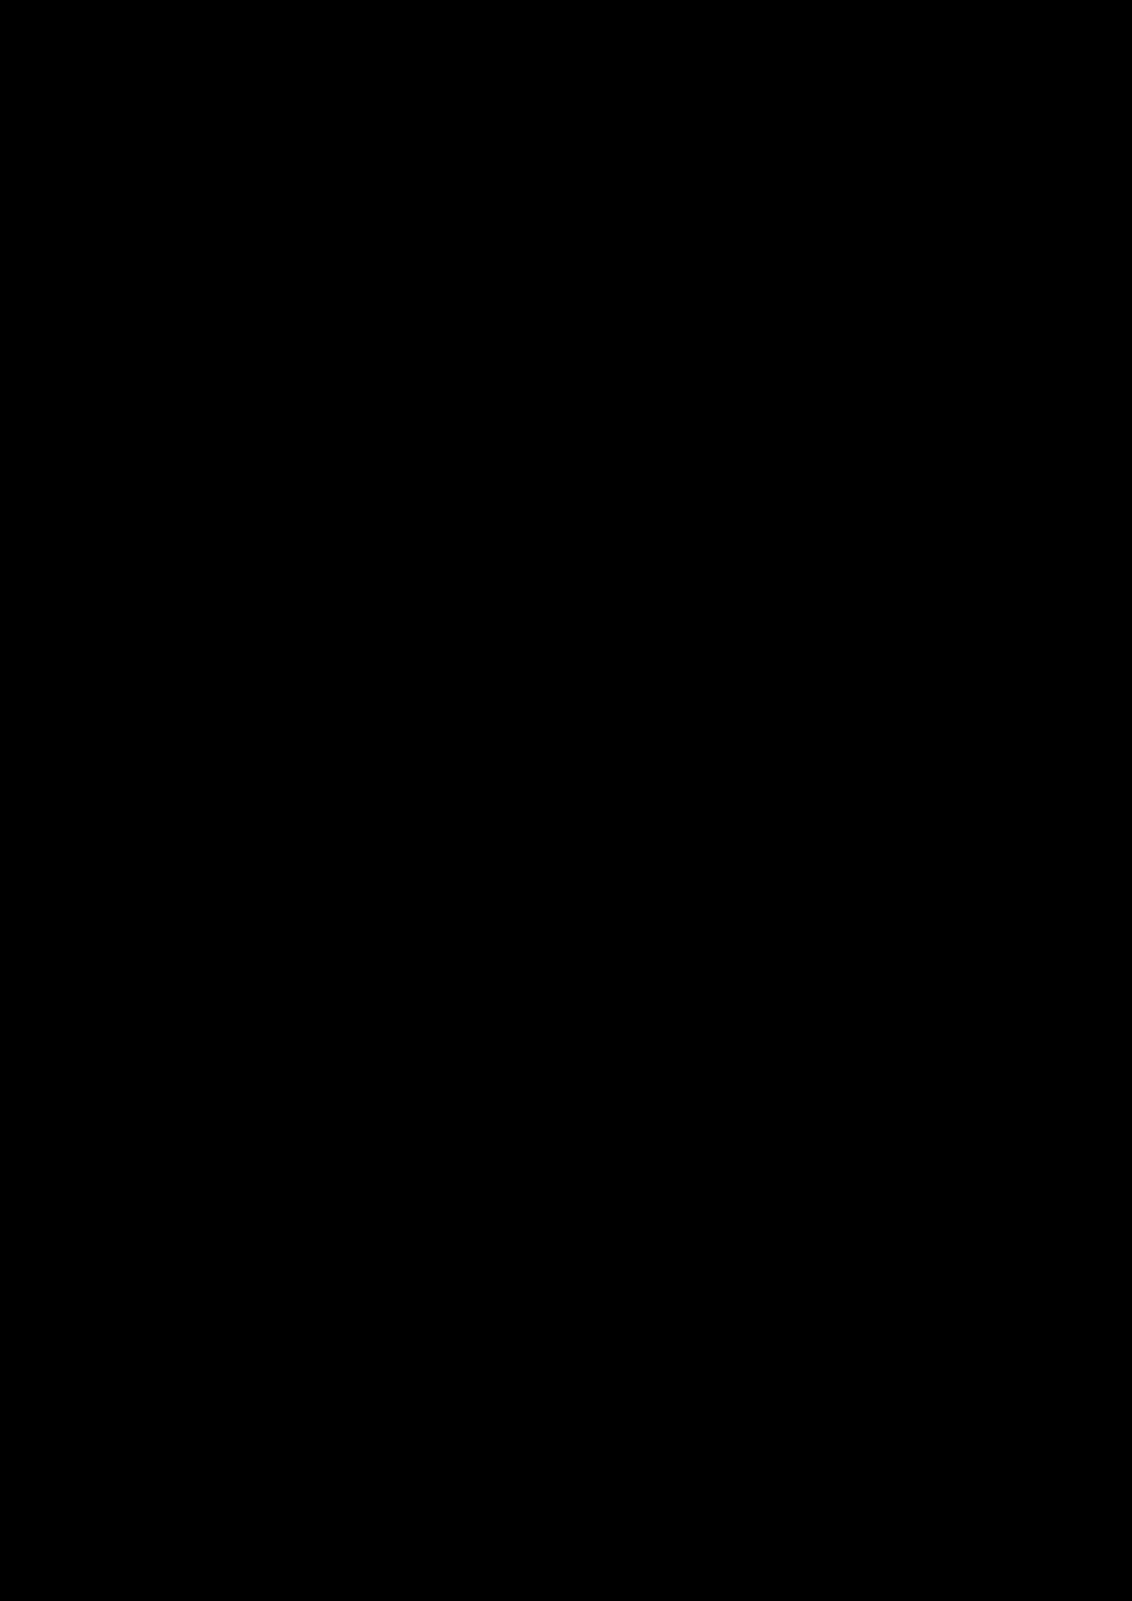 Ispoved Pervogo Boga slide, Image 33